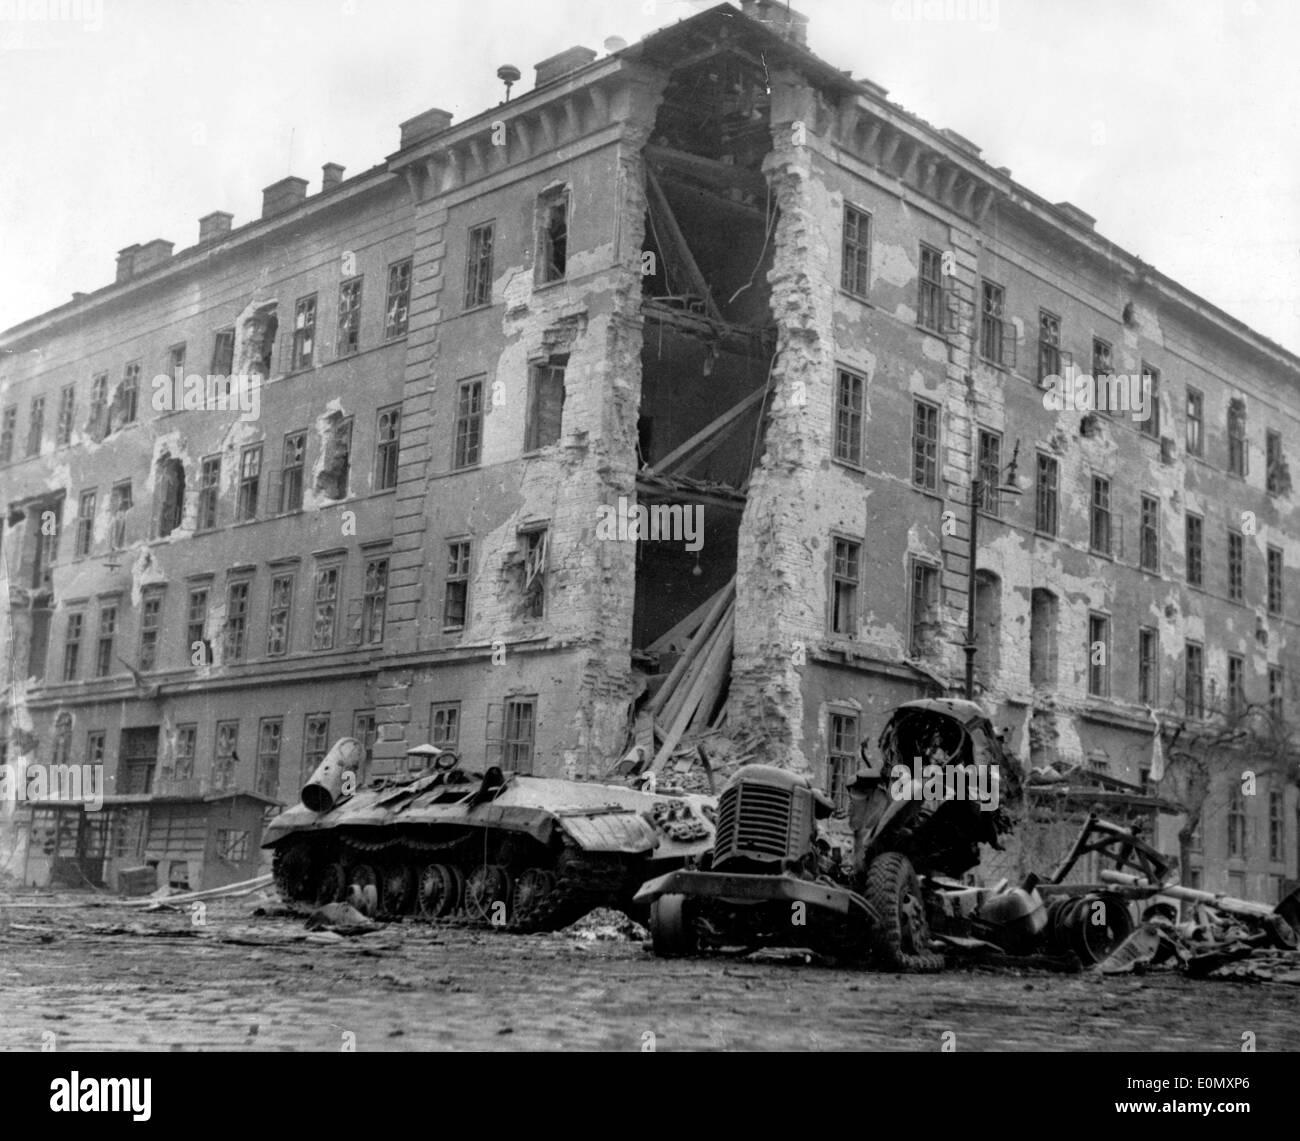 Destroyed Soviet tank during Hungarian Revolution - Stock Image